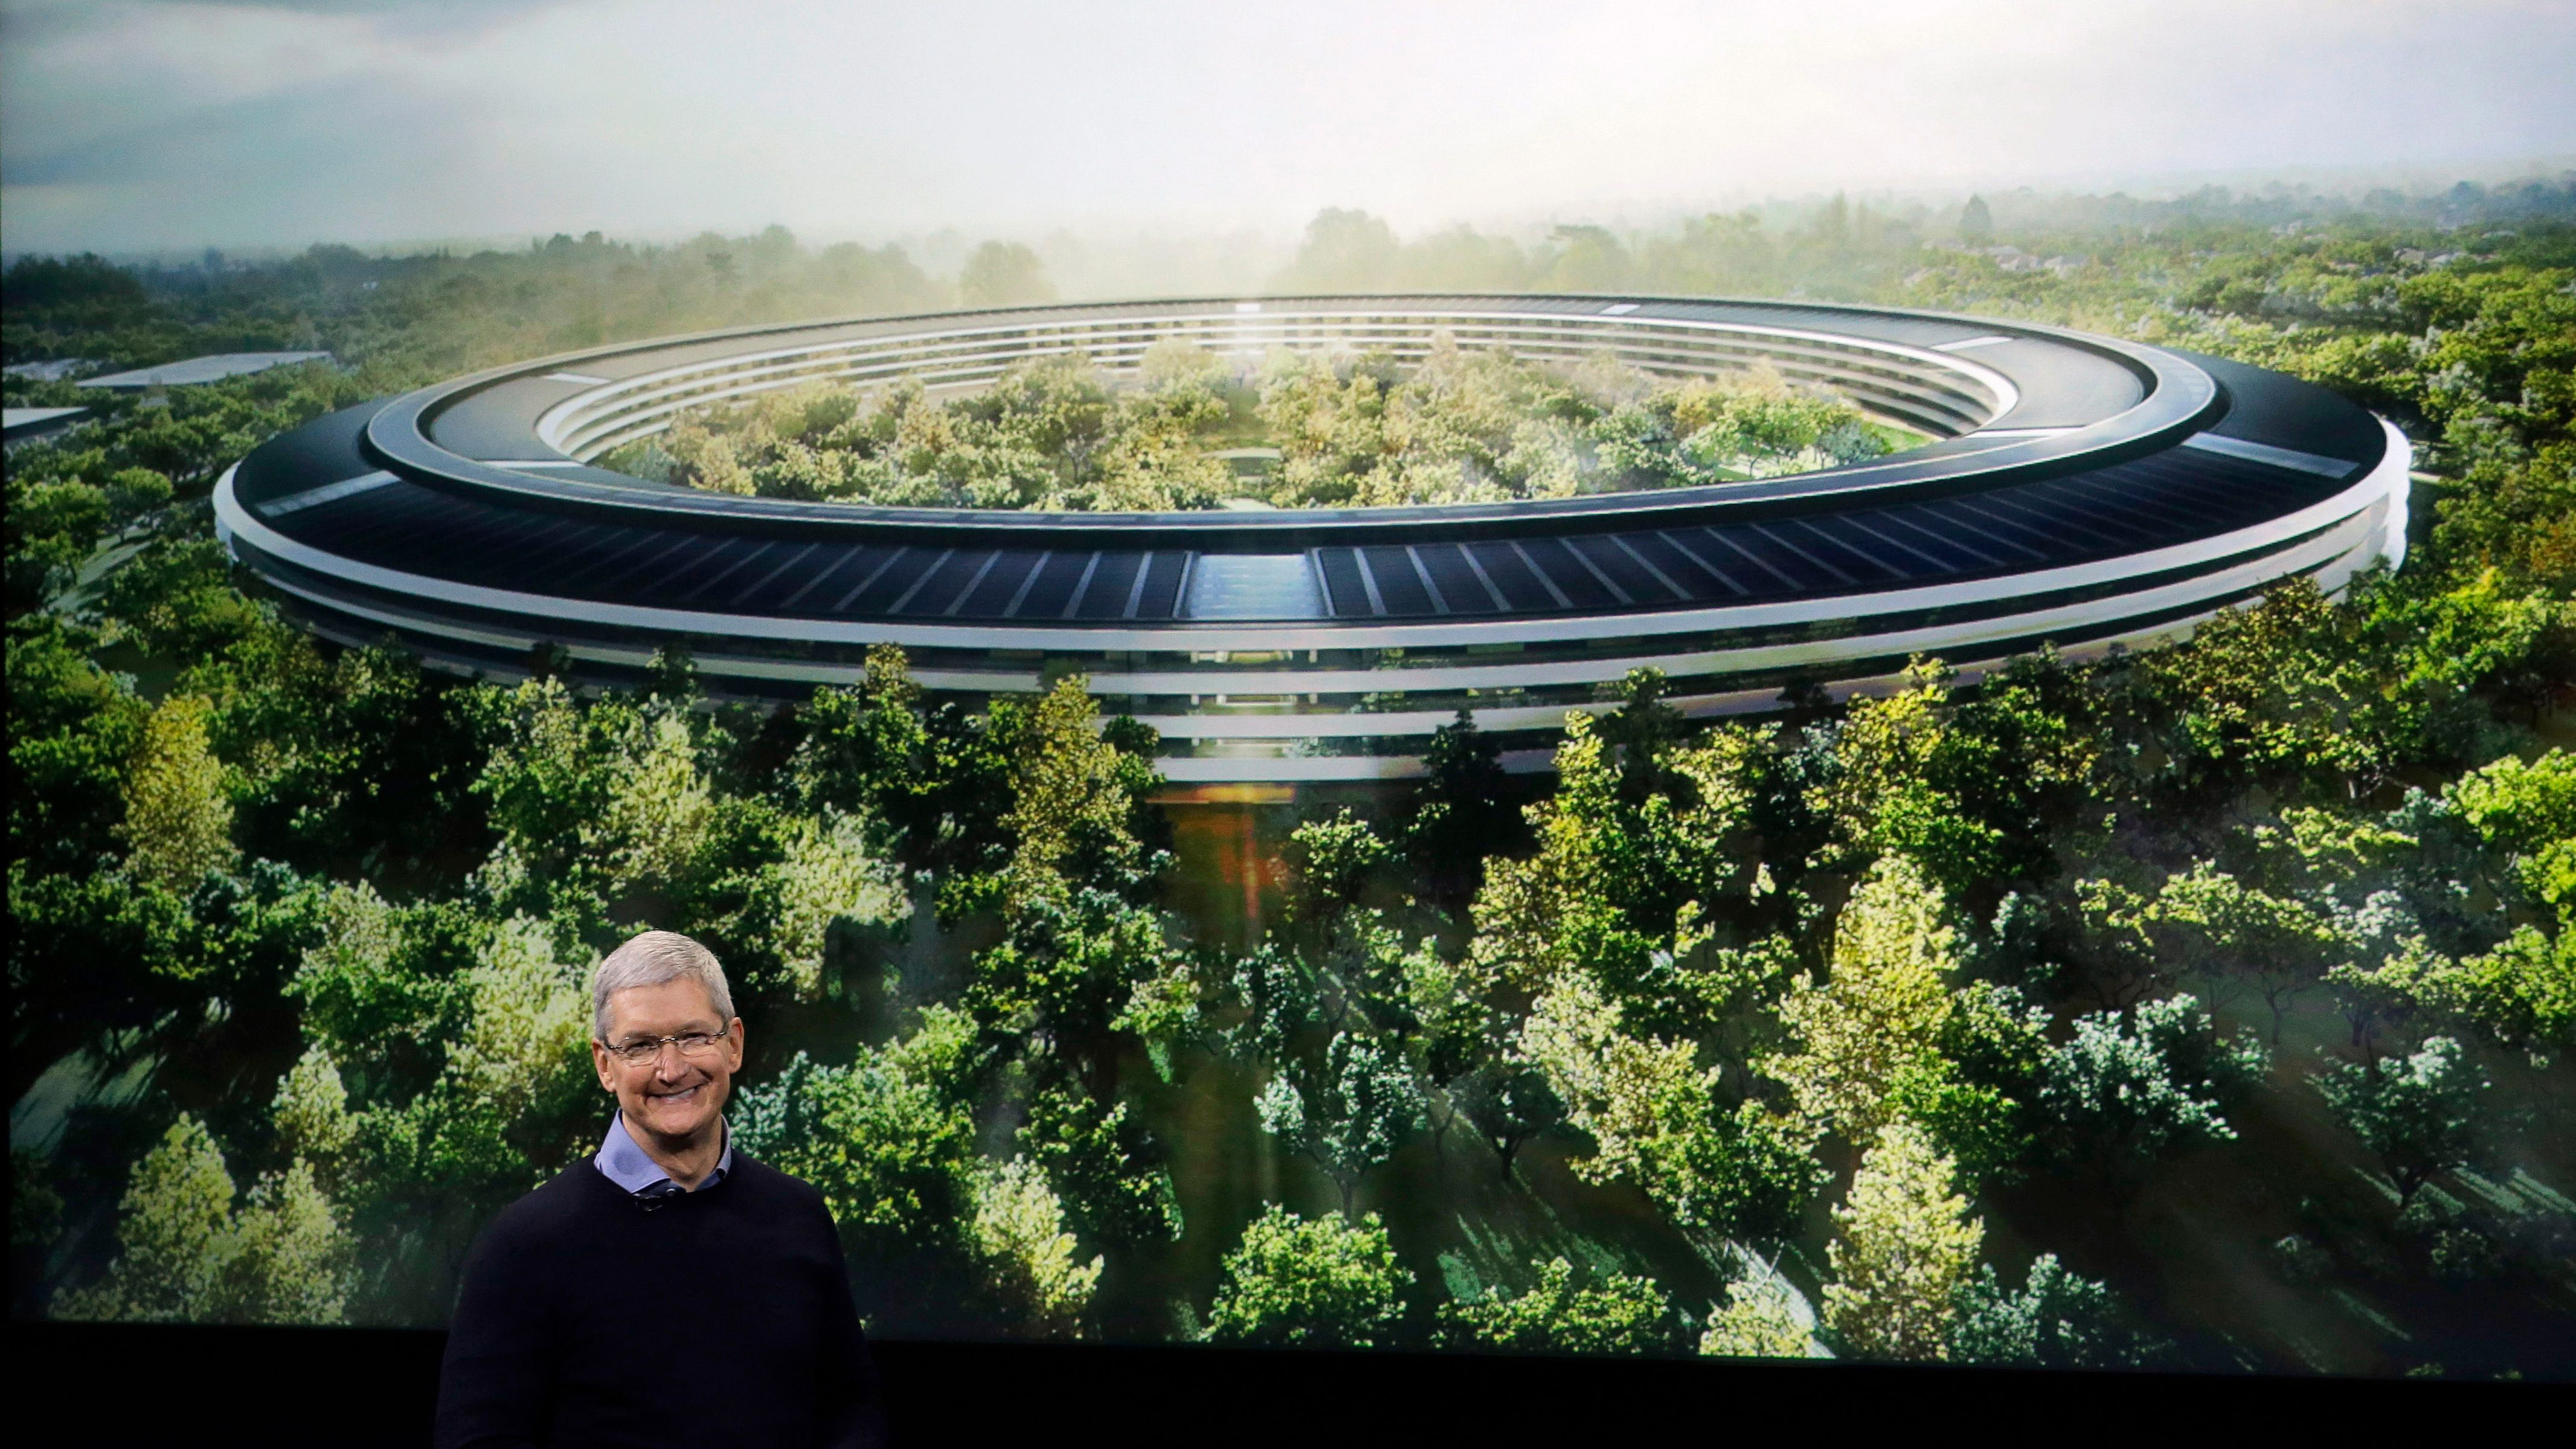 Apple's new $5 billion Apple Park campus has a 100,000-square-foot ...